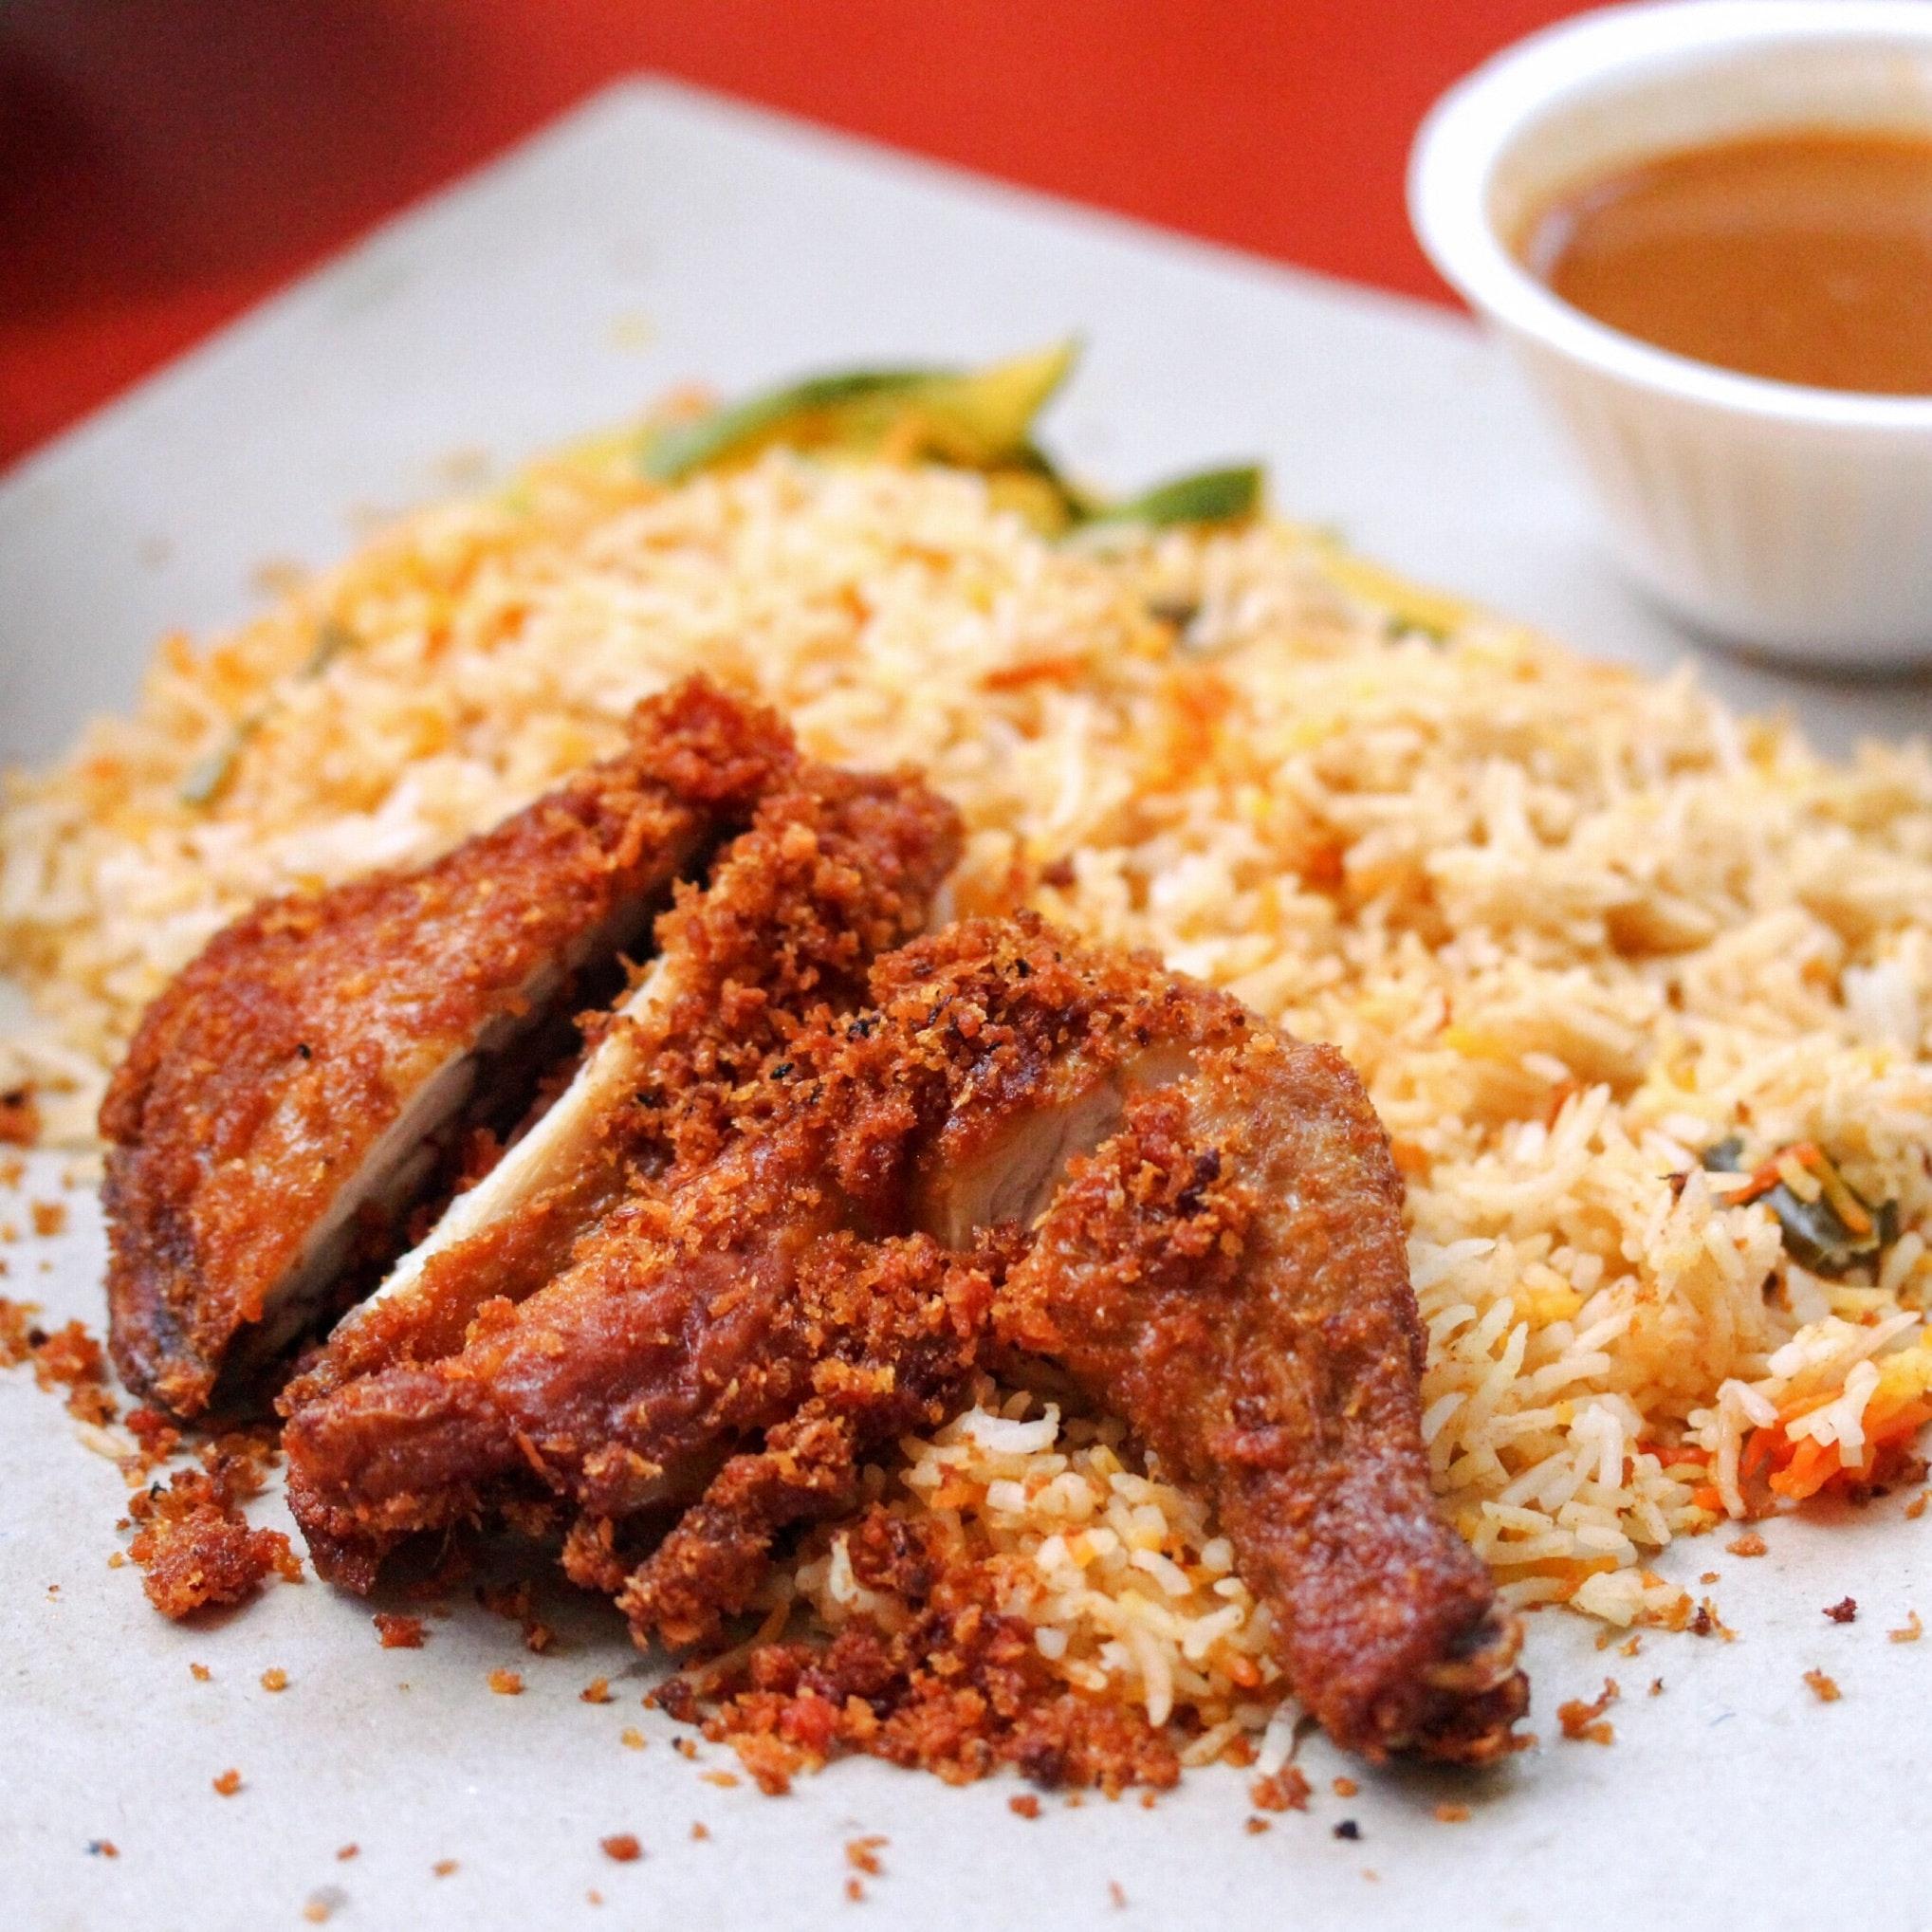 Taman Jurong Market & Food Centre